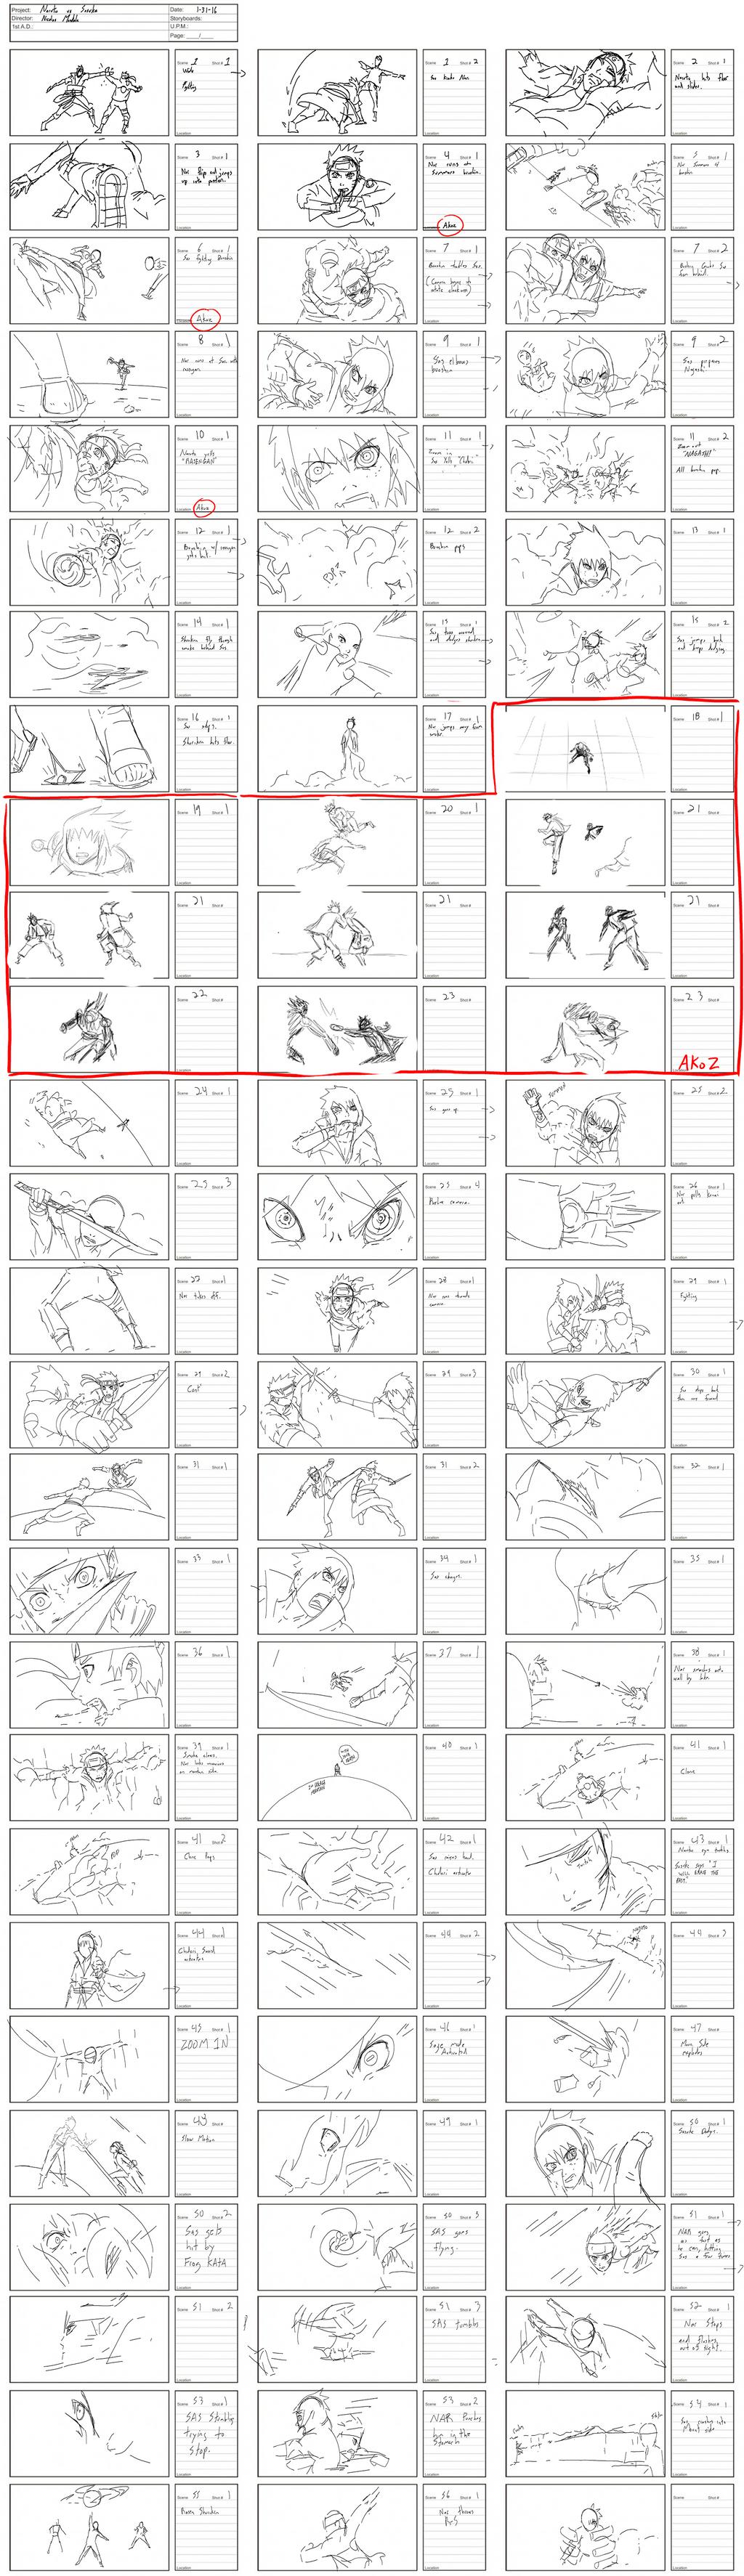 Naruto vs Sasuke Storyboard WIP